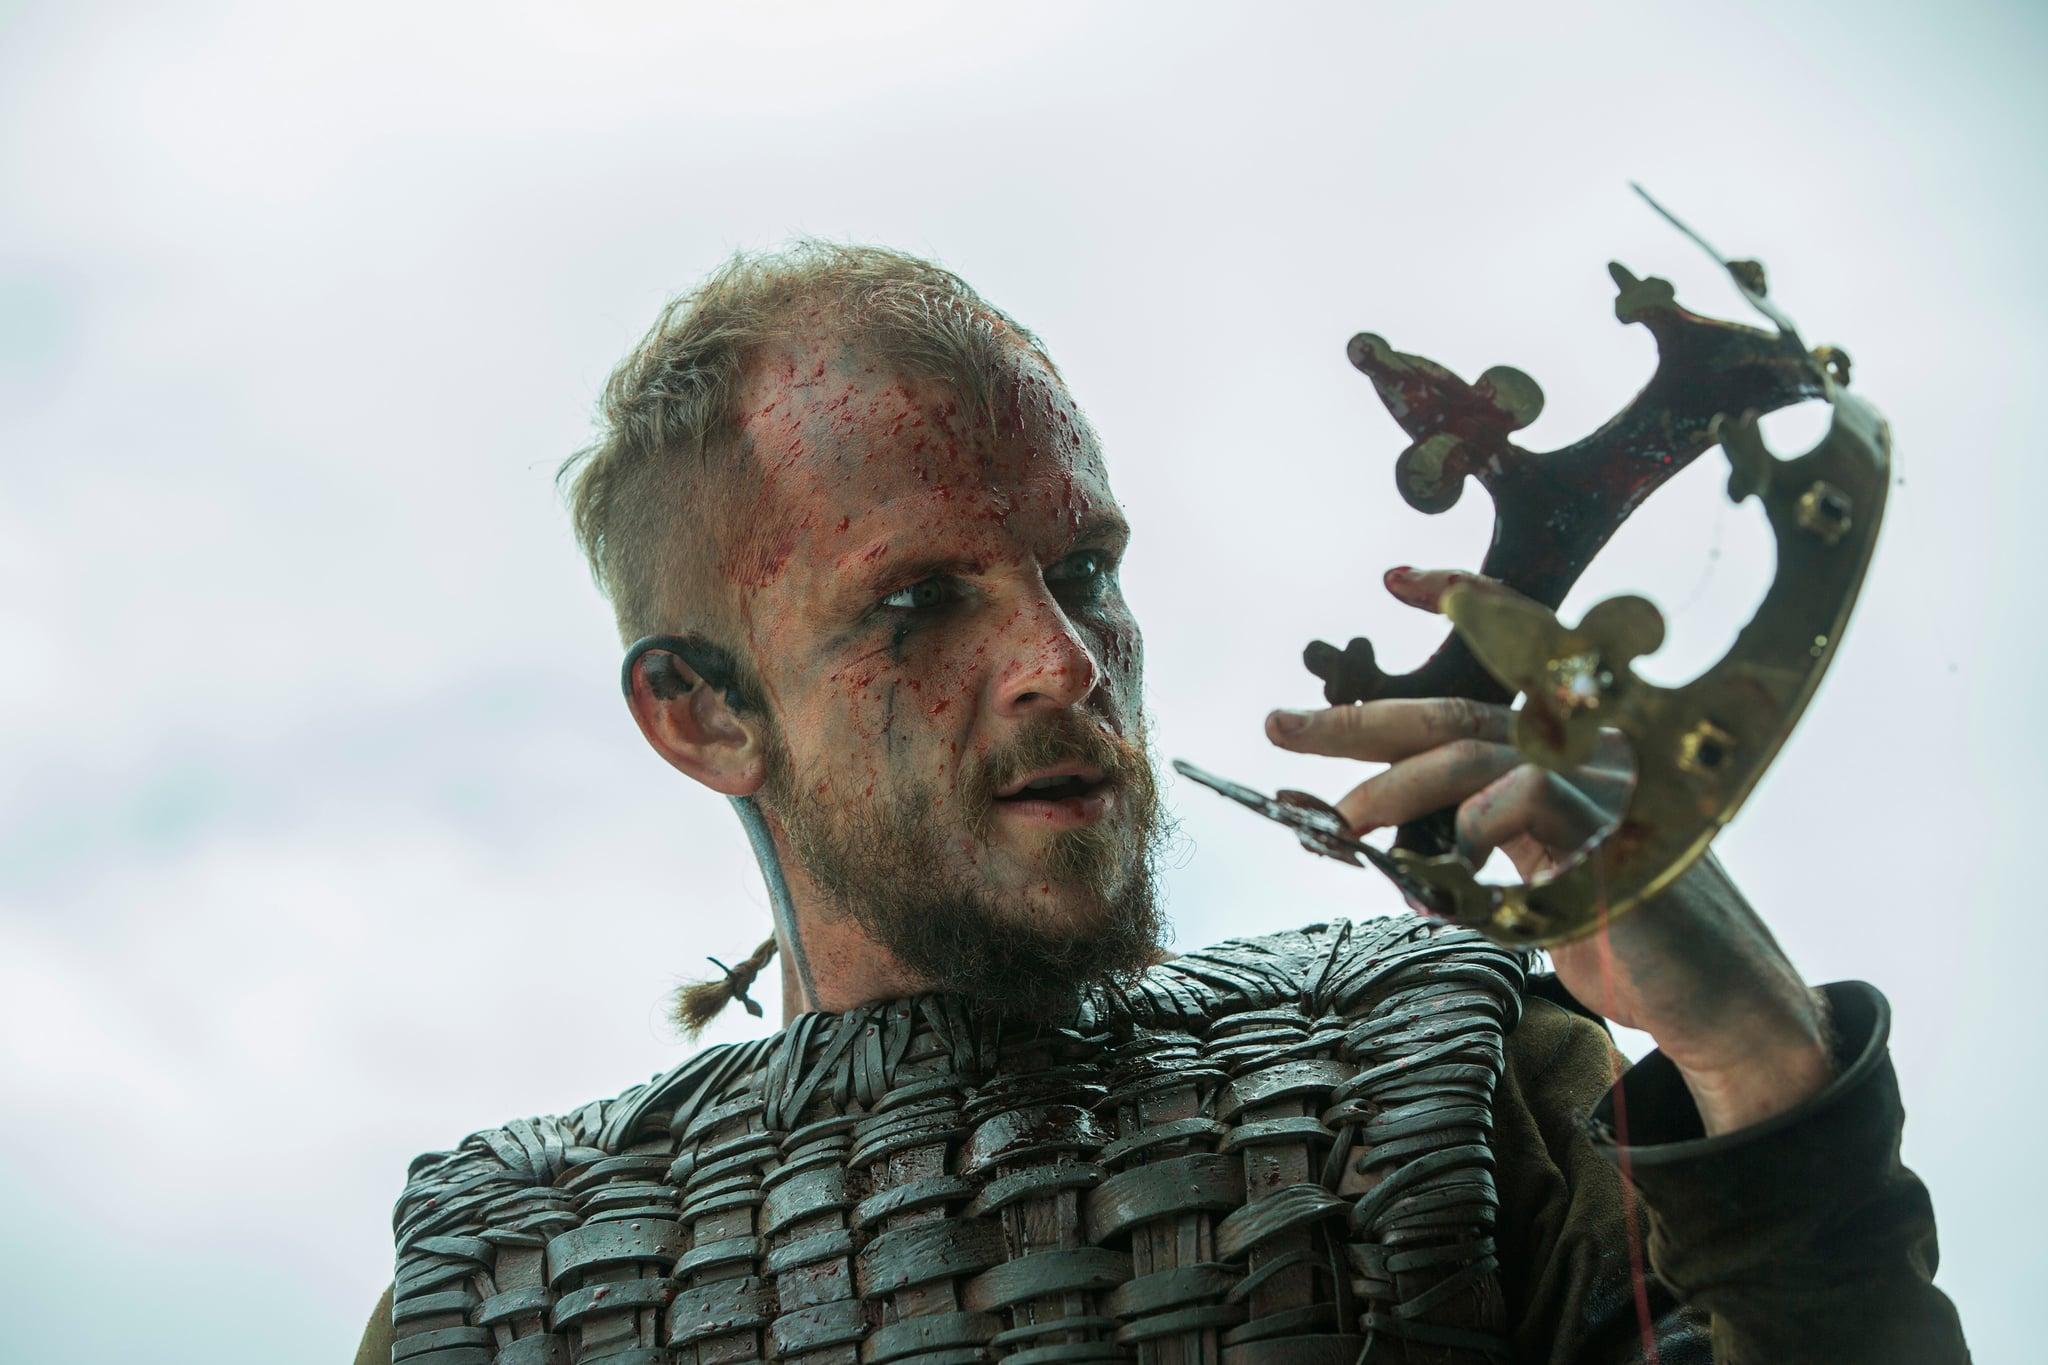 VIKINGS, Gustaf Skarsgard, 'Mercenary', (Season 3, ep. 301, aired Feb. 19, 2015). photo: Jonathan Hession / History Channel / courtesy Everett Collection